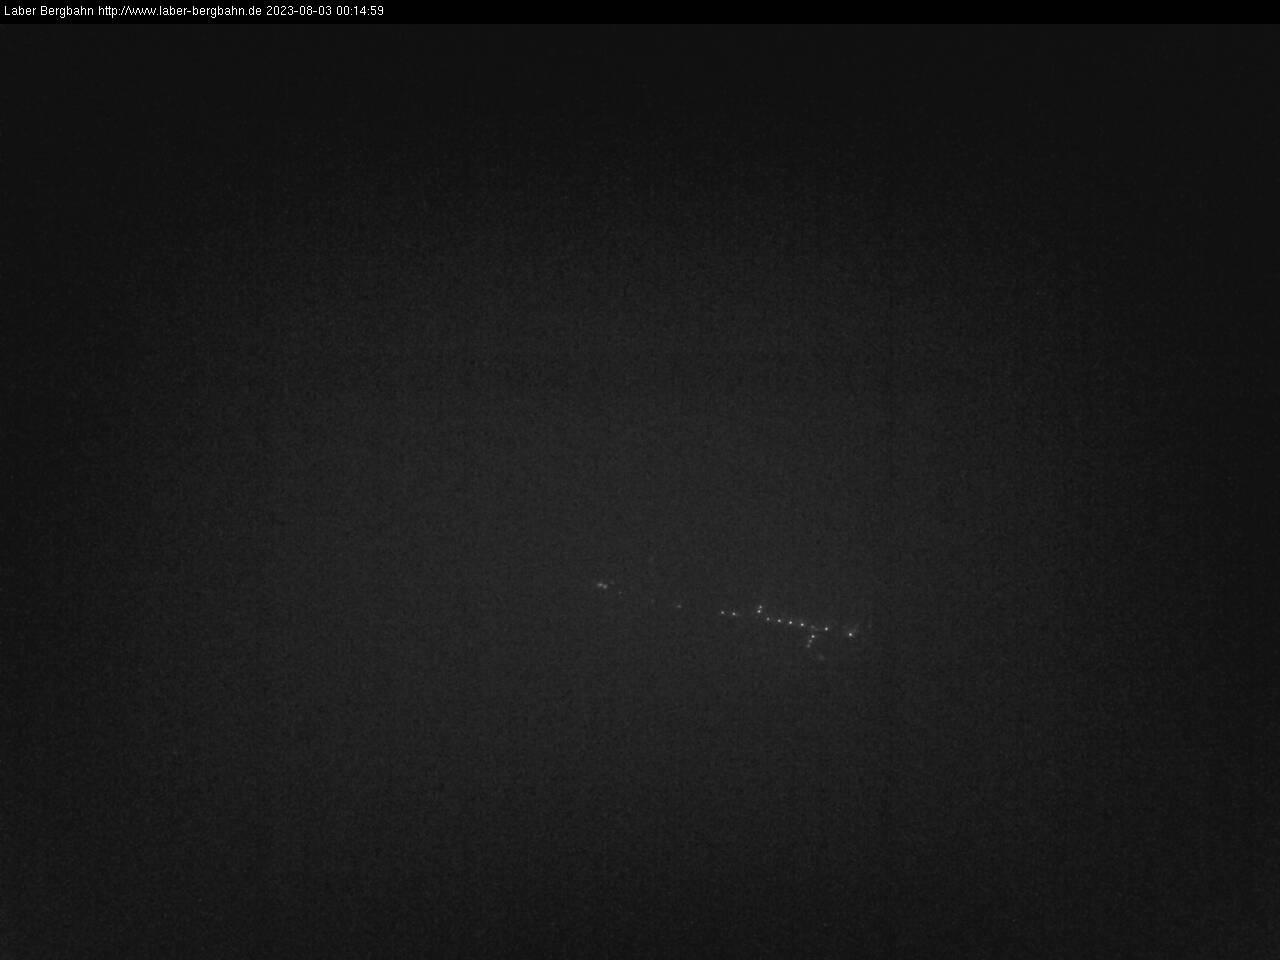 Webcam Laberbergbahn SÜD